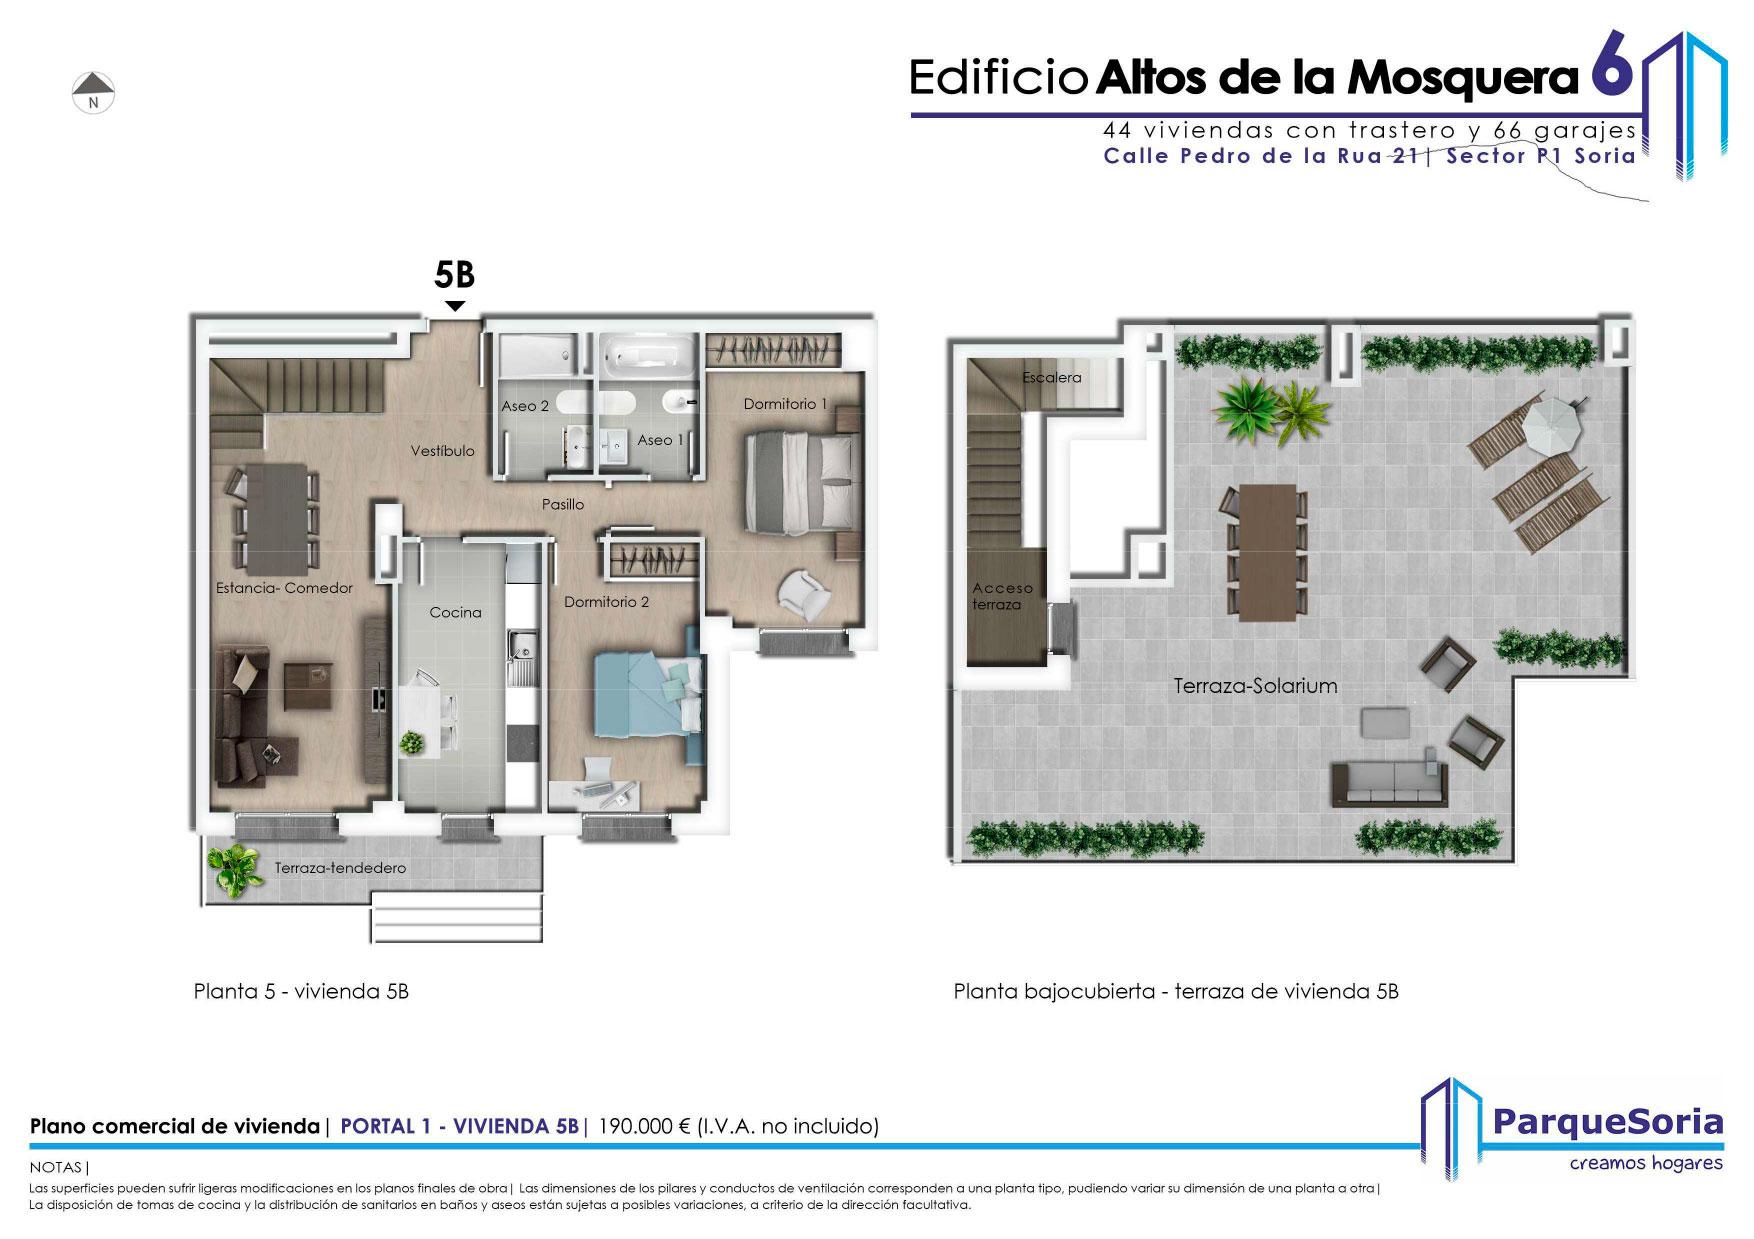 Parquesoria-Altos-de-la-mosquera-6-5B-2